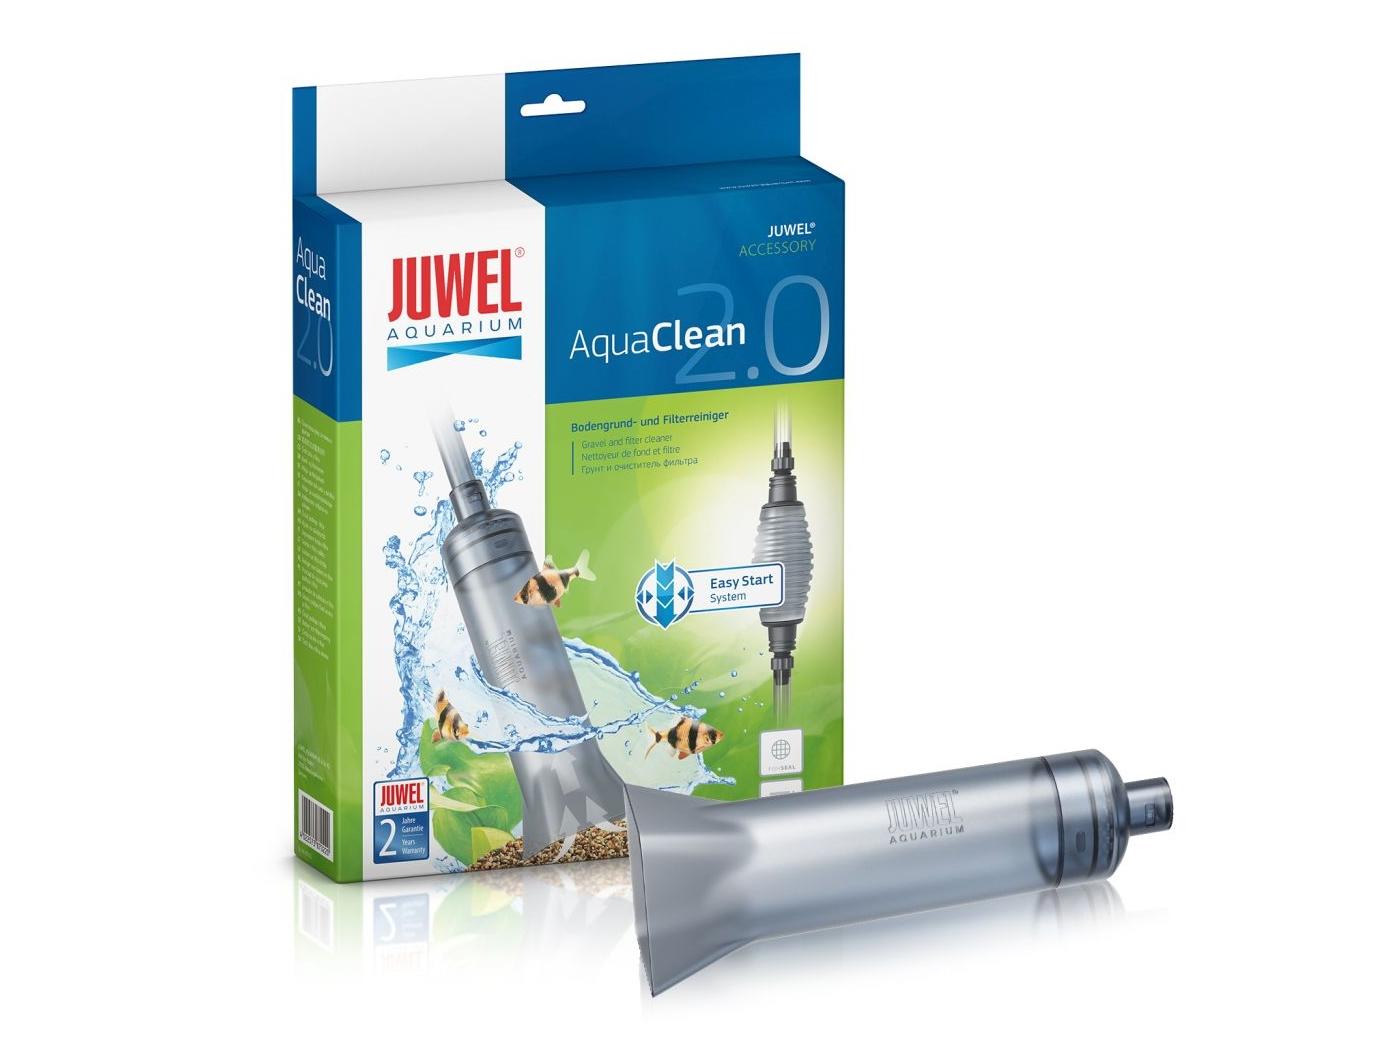 Juwel Aqua Clean kit 2.0 pre odstraňovanie kalov